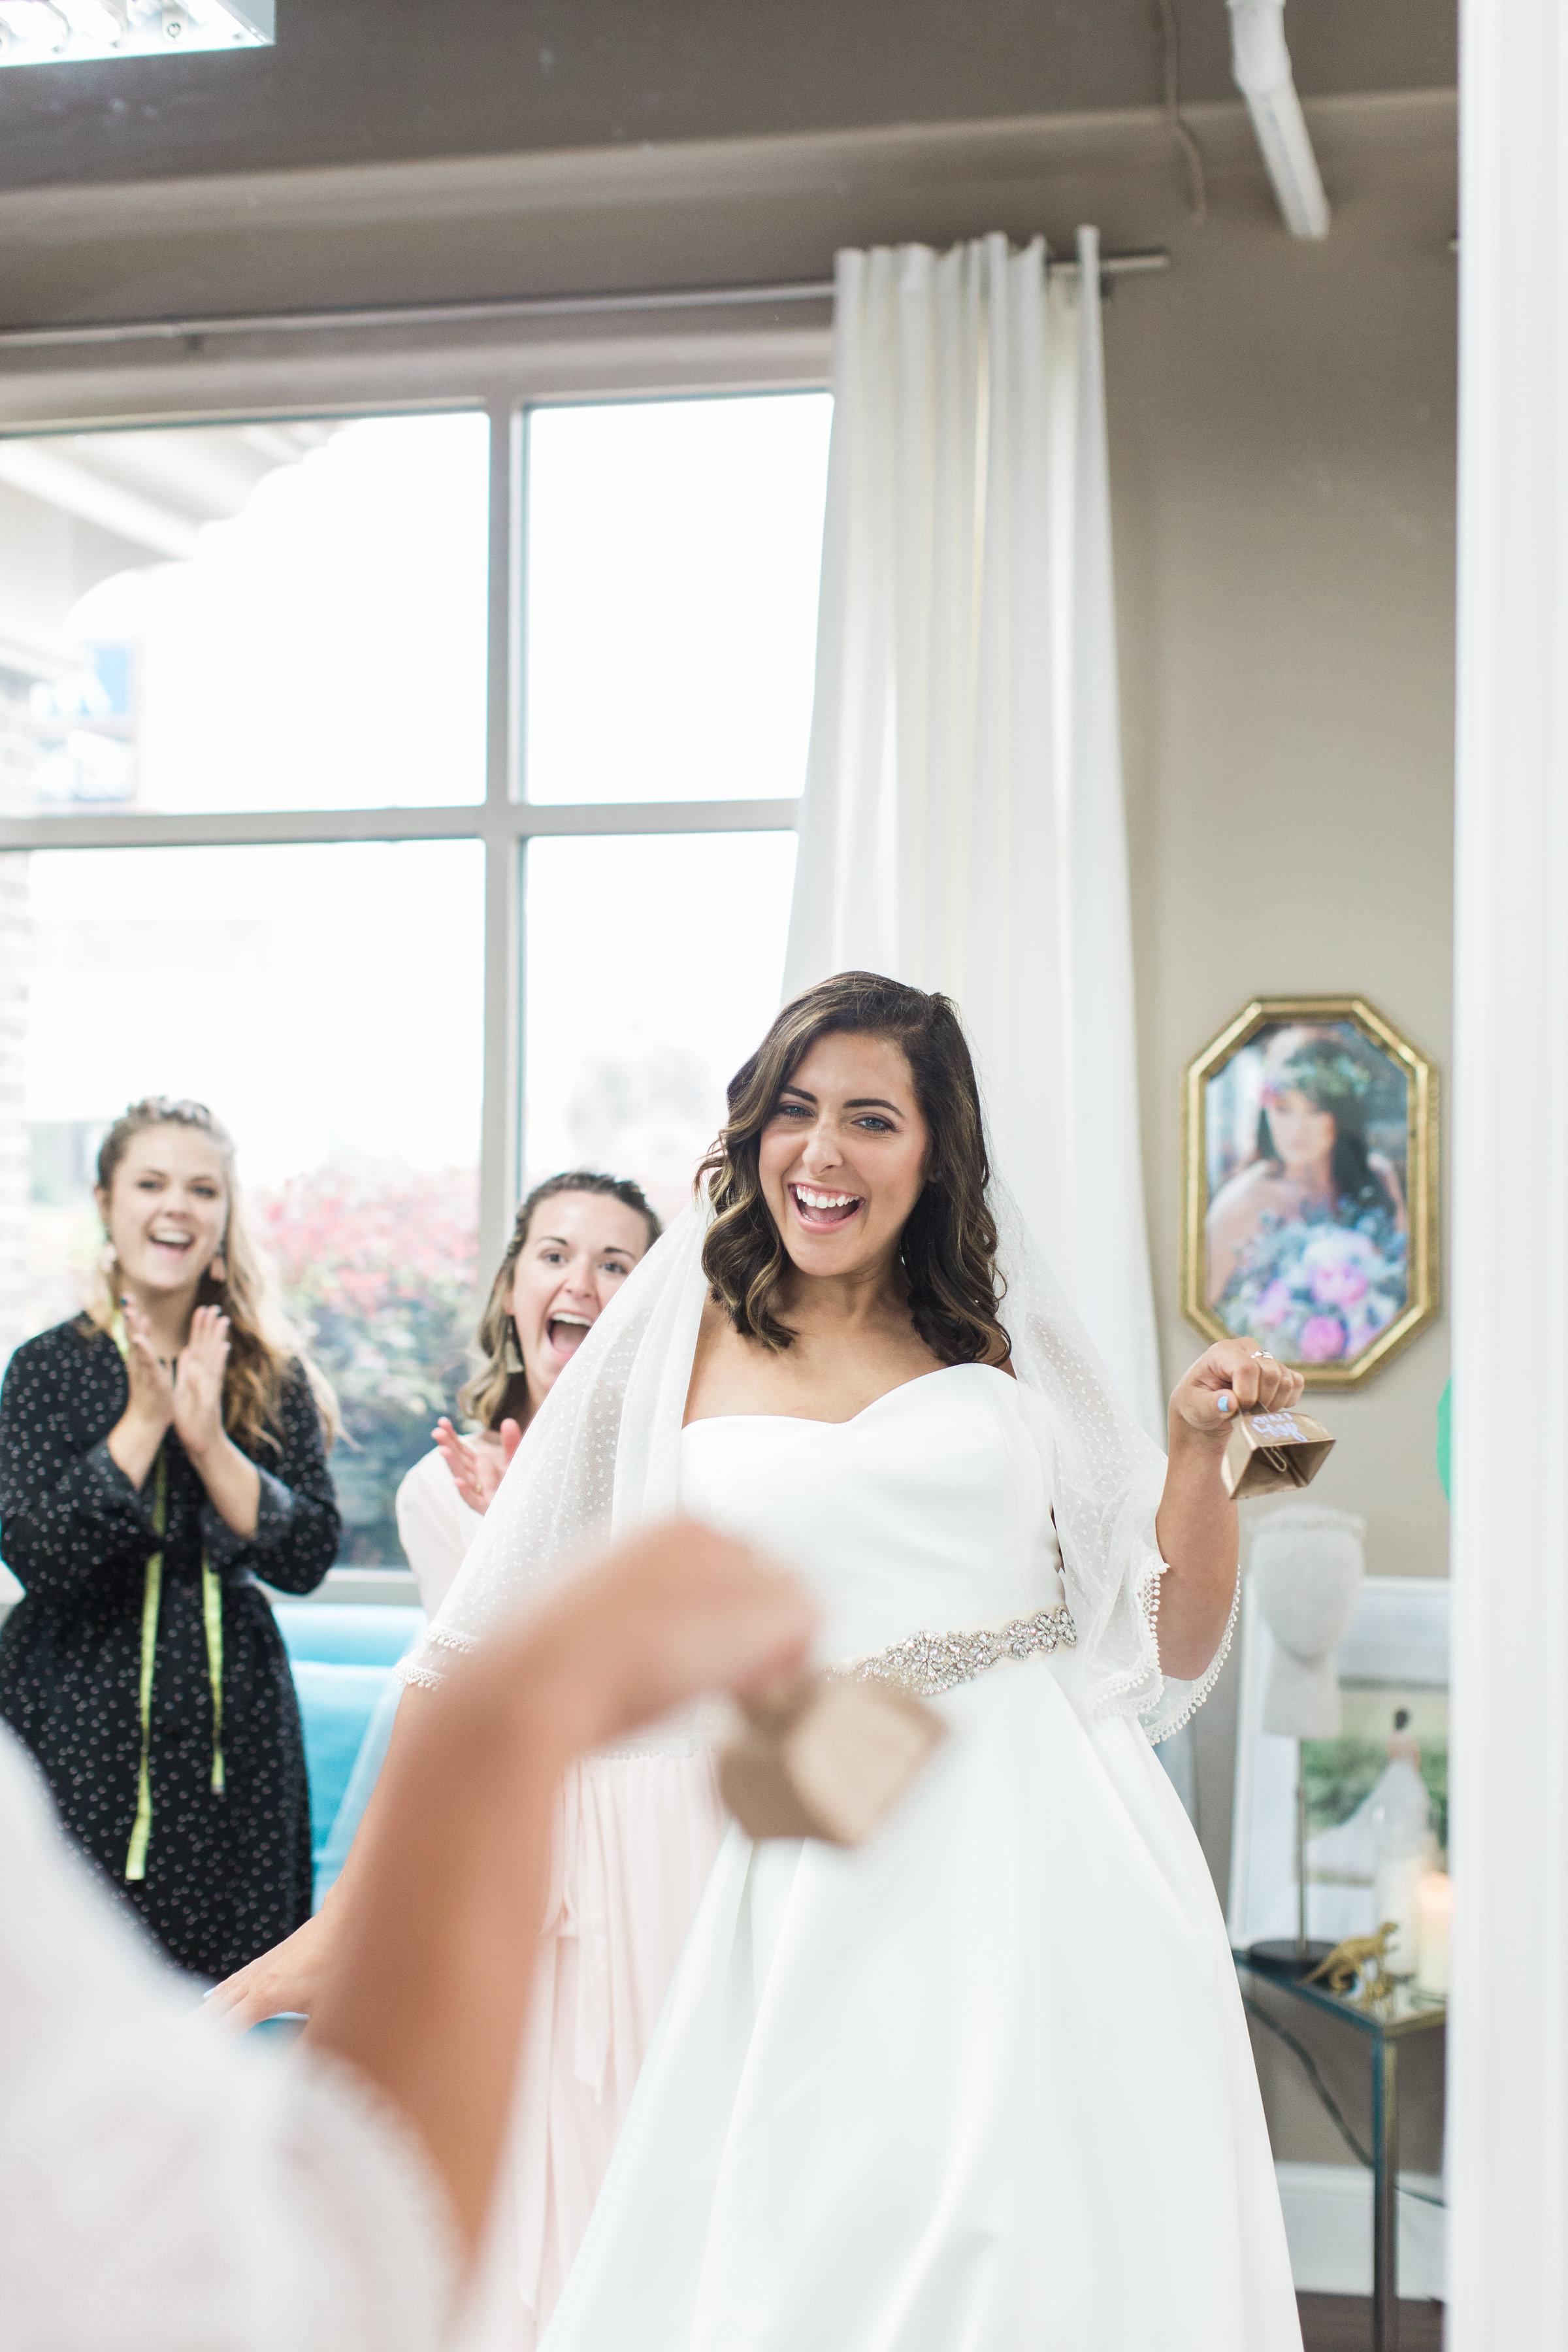 say-yes-to-the-dress-savannah-bridal-boutique-savannah-bridal-shop-savannah-bride-savannah-wedding-savannah-wedding-gowns-weddings-in-savannah-bridal-appointments-wedding-dress-savannah-veil-tiara-bridal-belt-wedding-dress.jpg